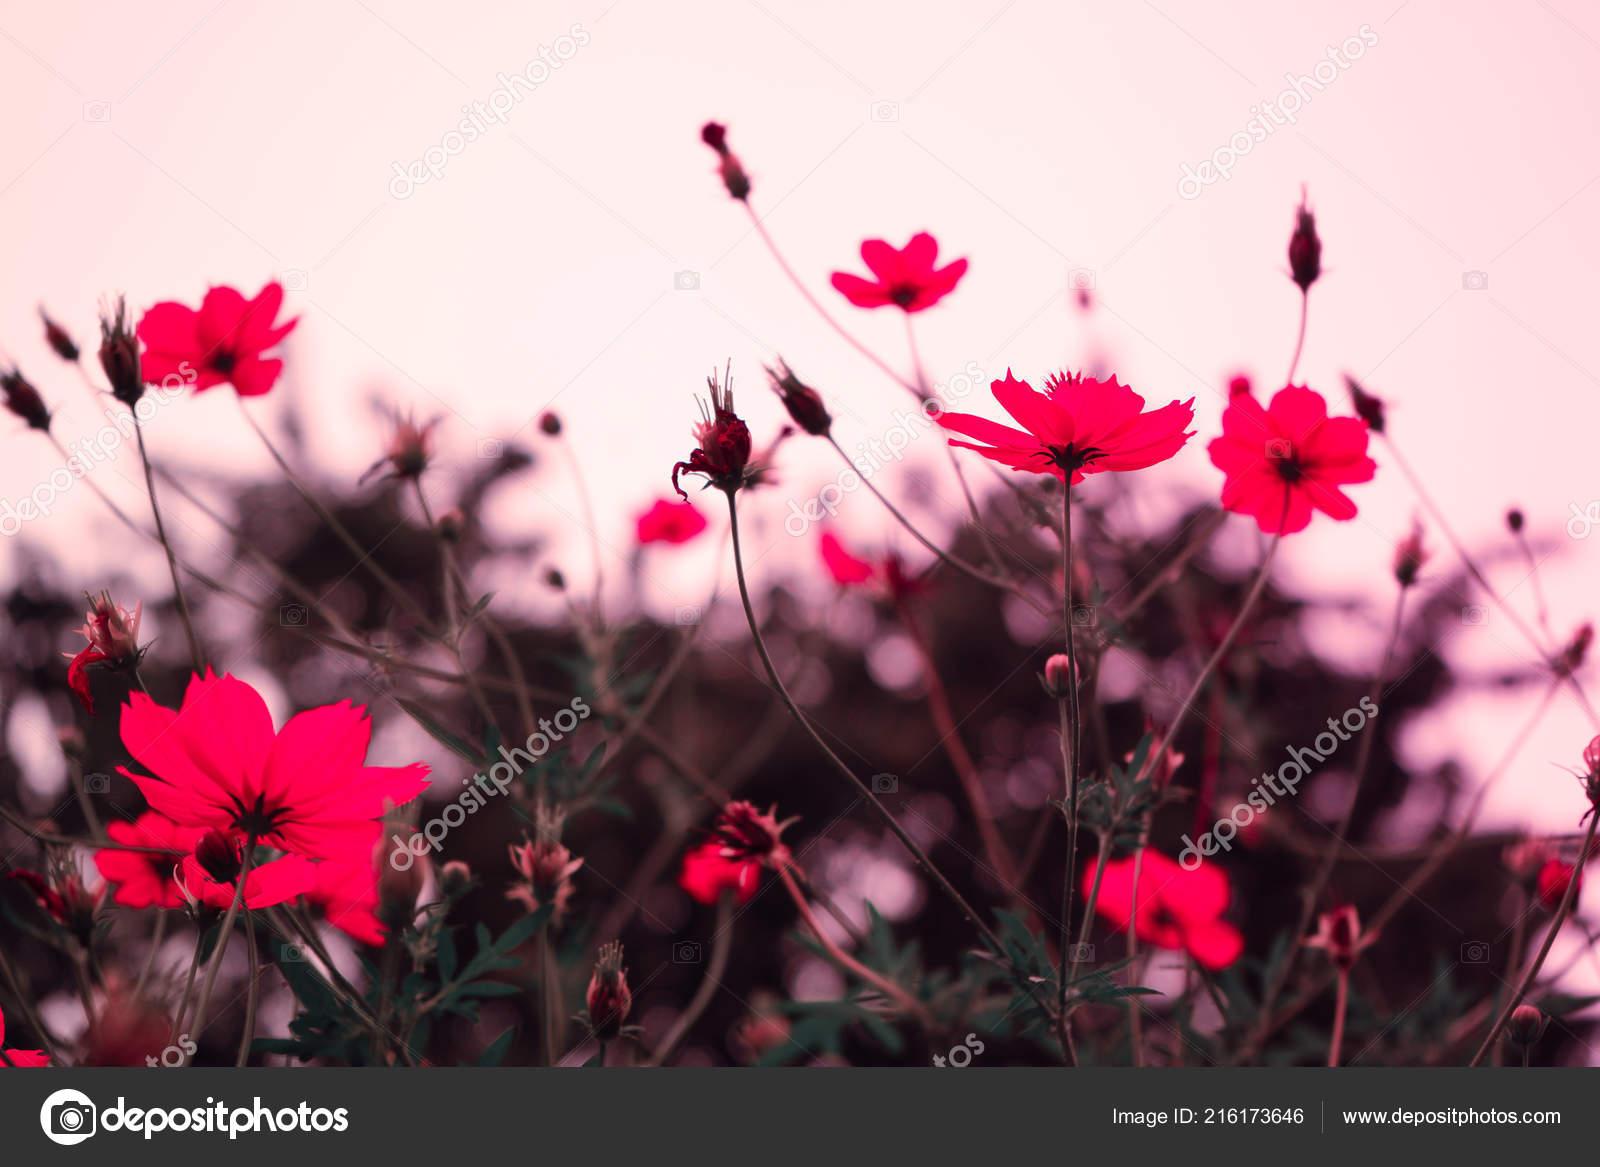 Hd Pink Flower Wallpaper Pink Flower Background Nature